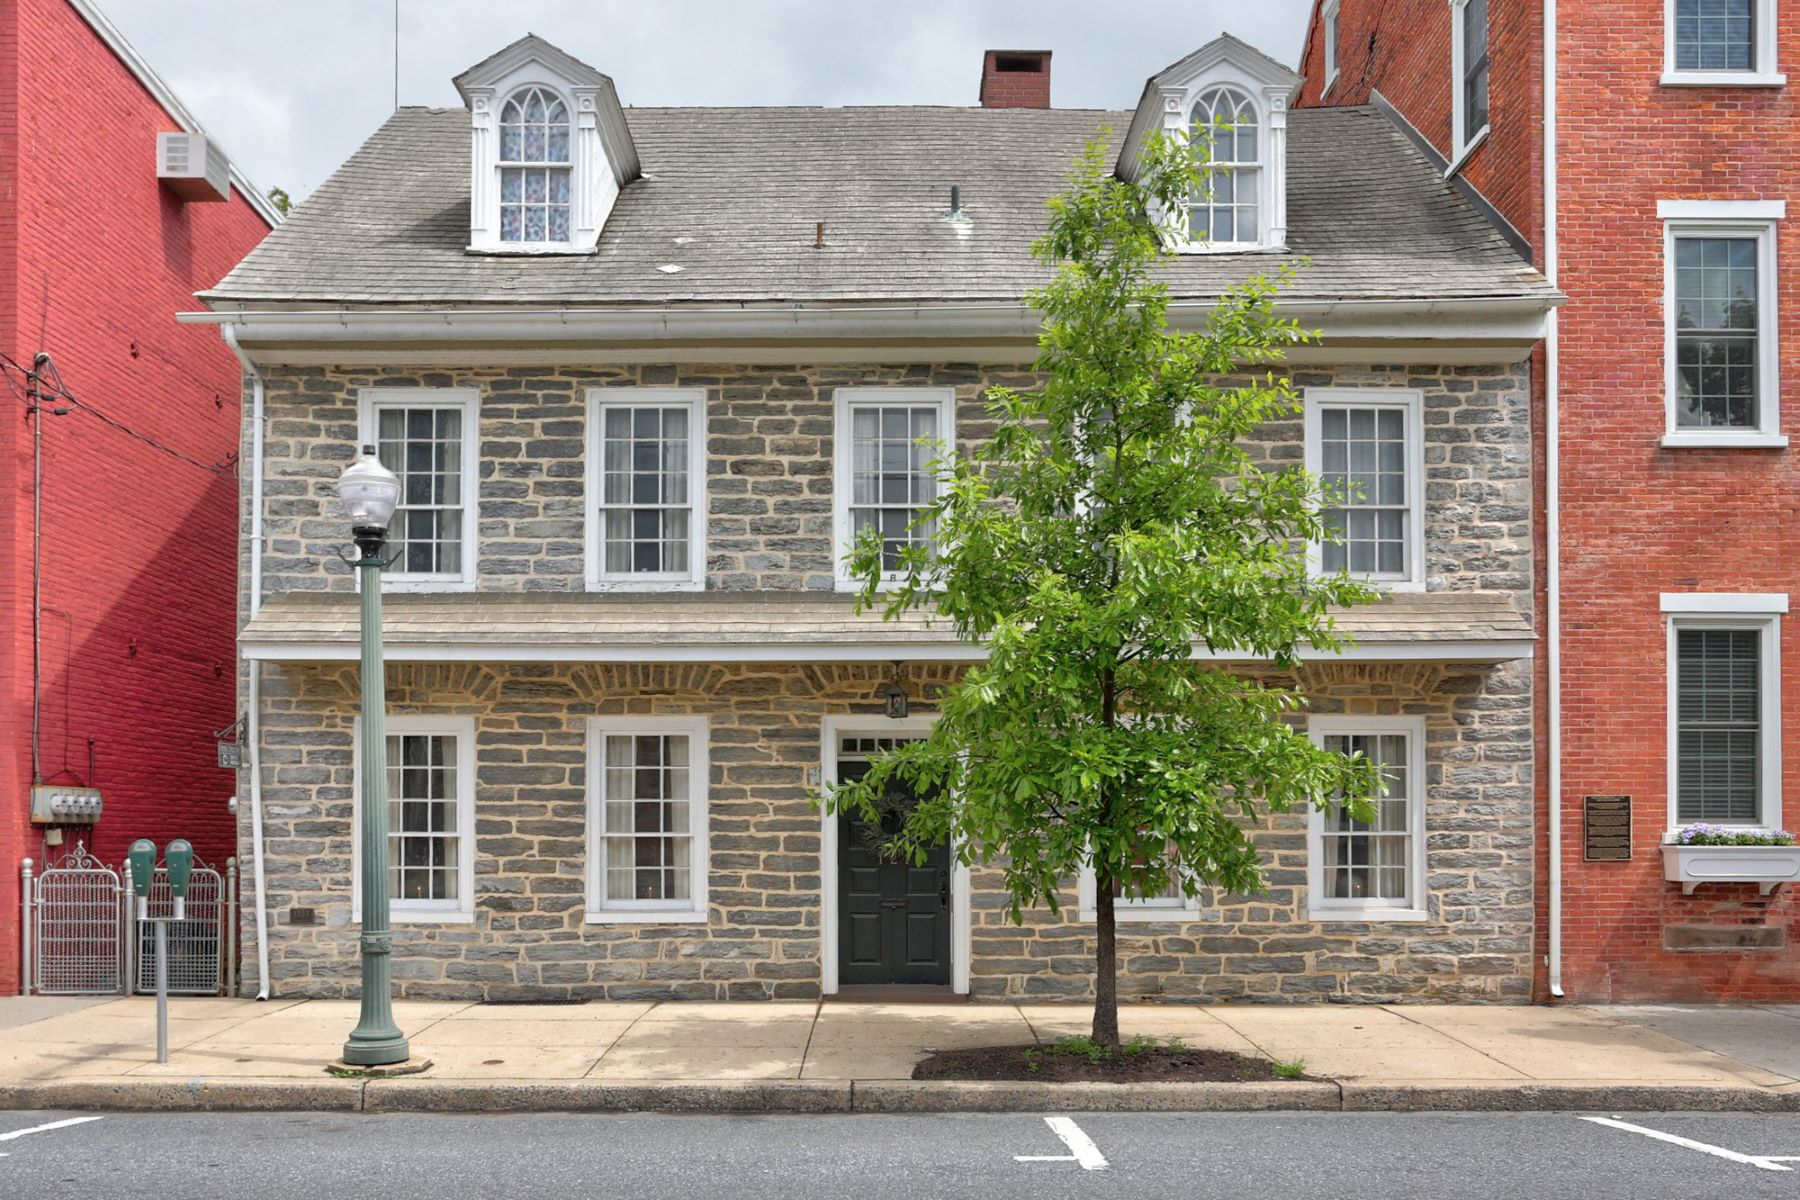 Single Family Home for Sale at 121 E Main Street 121 E Main Street Lititz, Pennsylvania 17543 United States